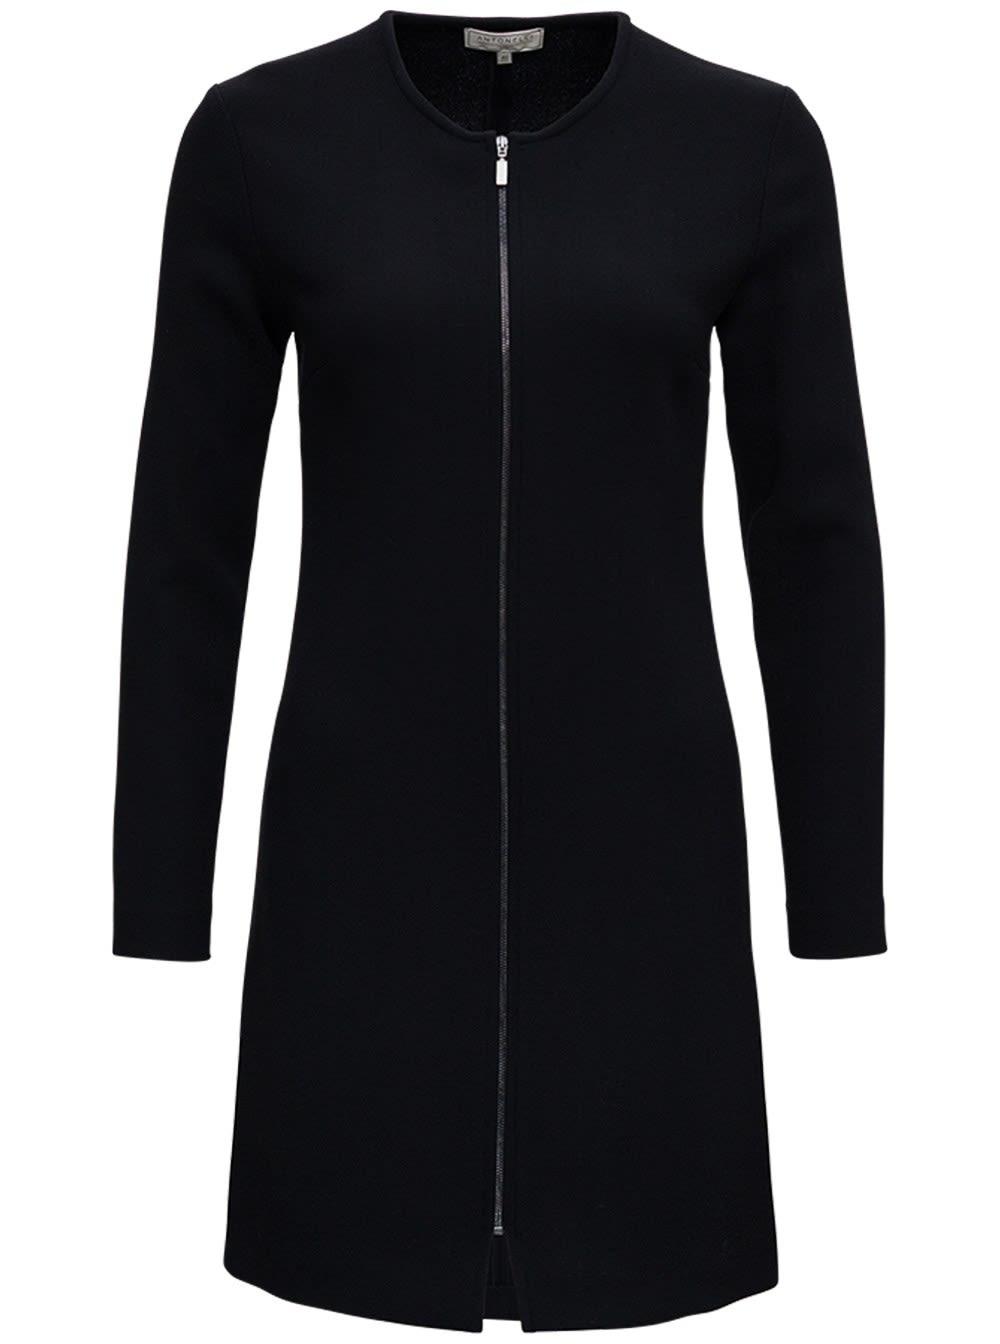 Black Orazio Dress In Wool Blend